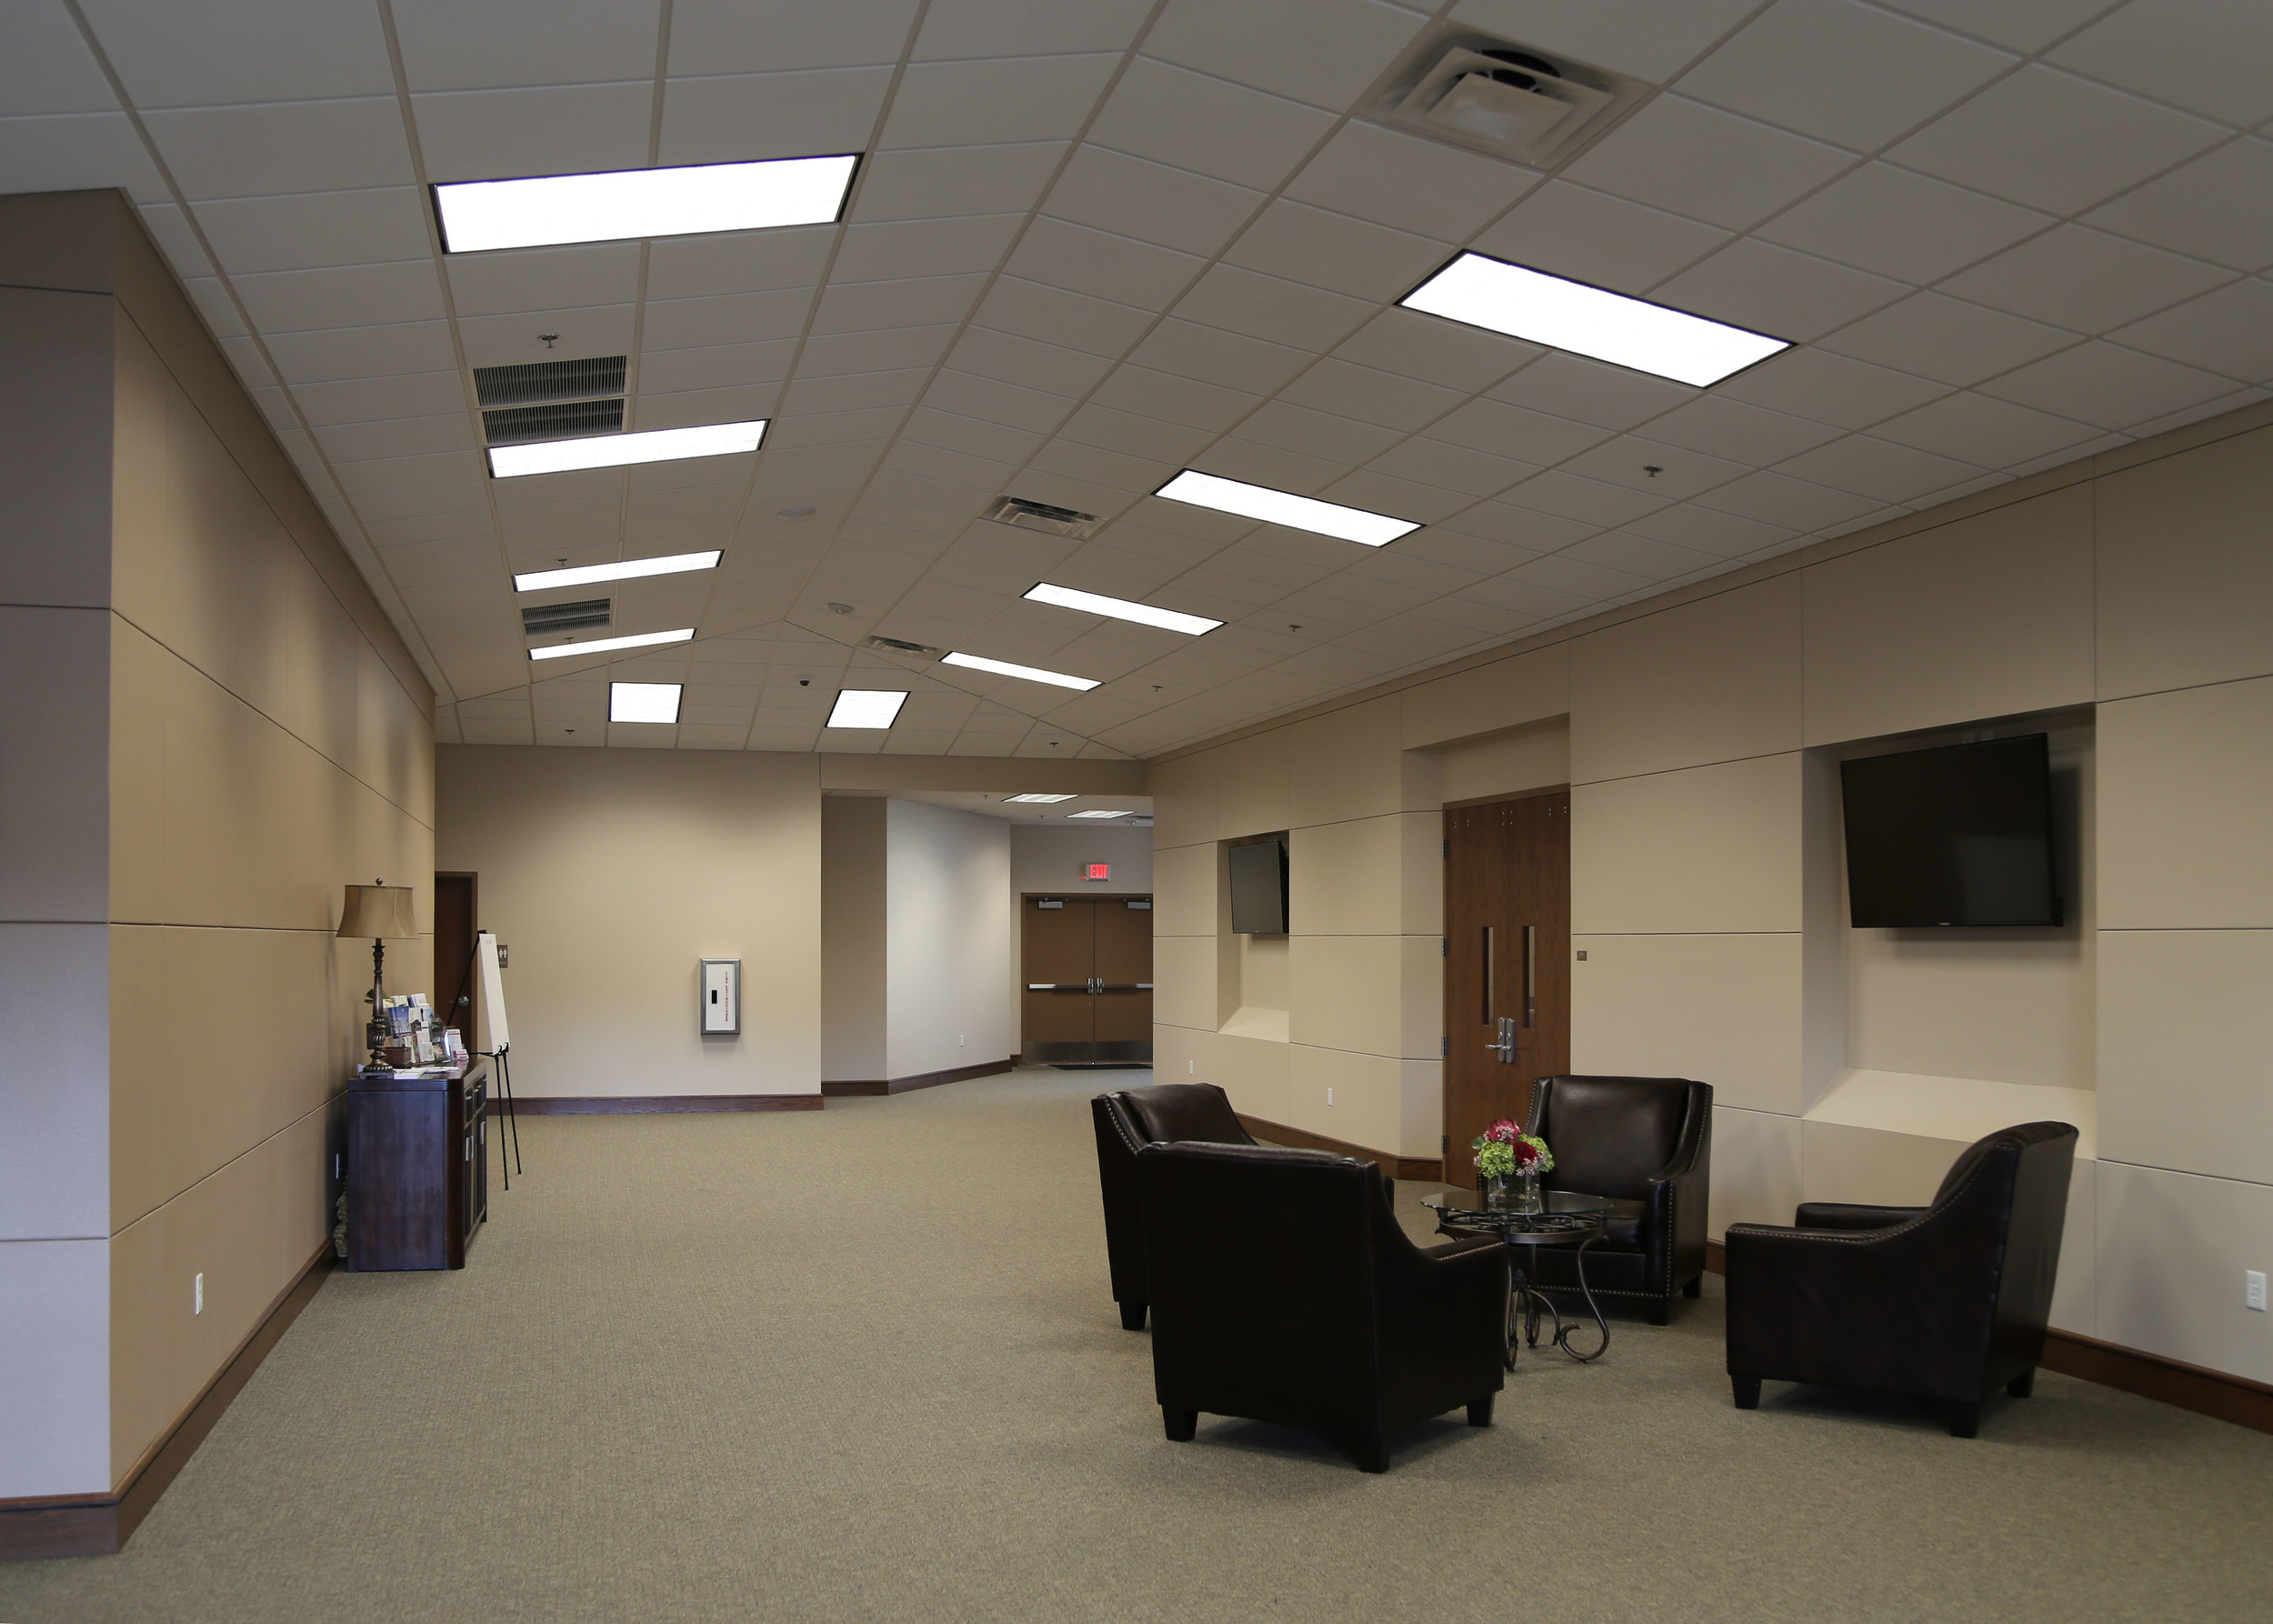 ESDA Interior 01 - Gathering Hall copy.jpg